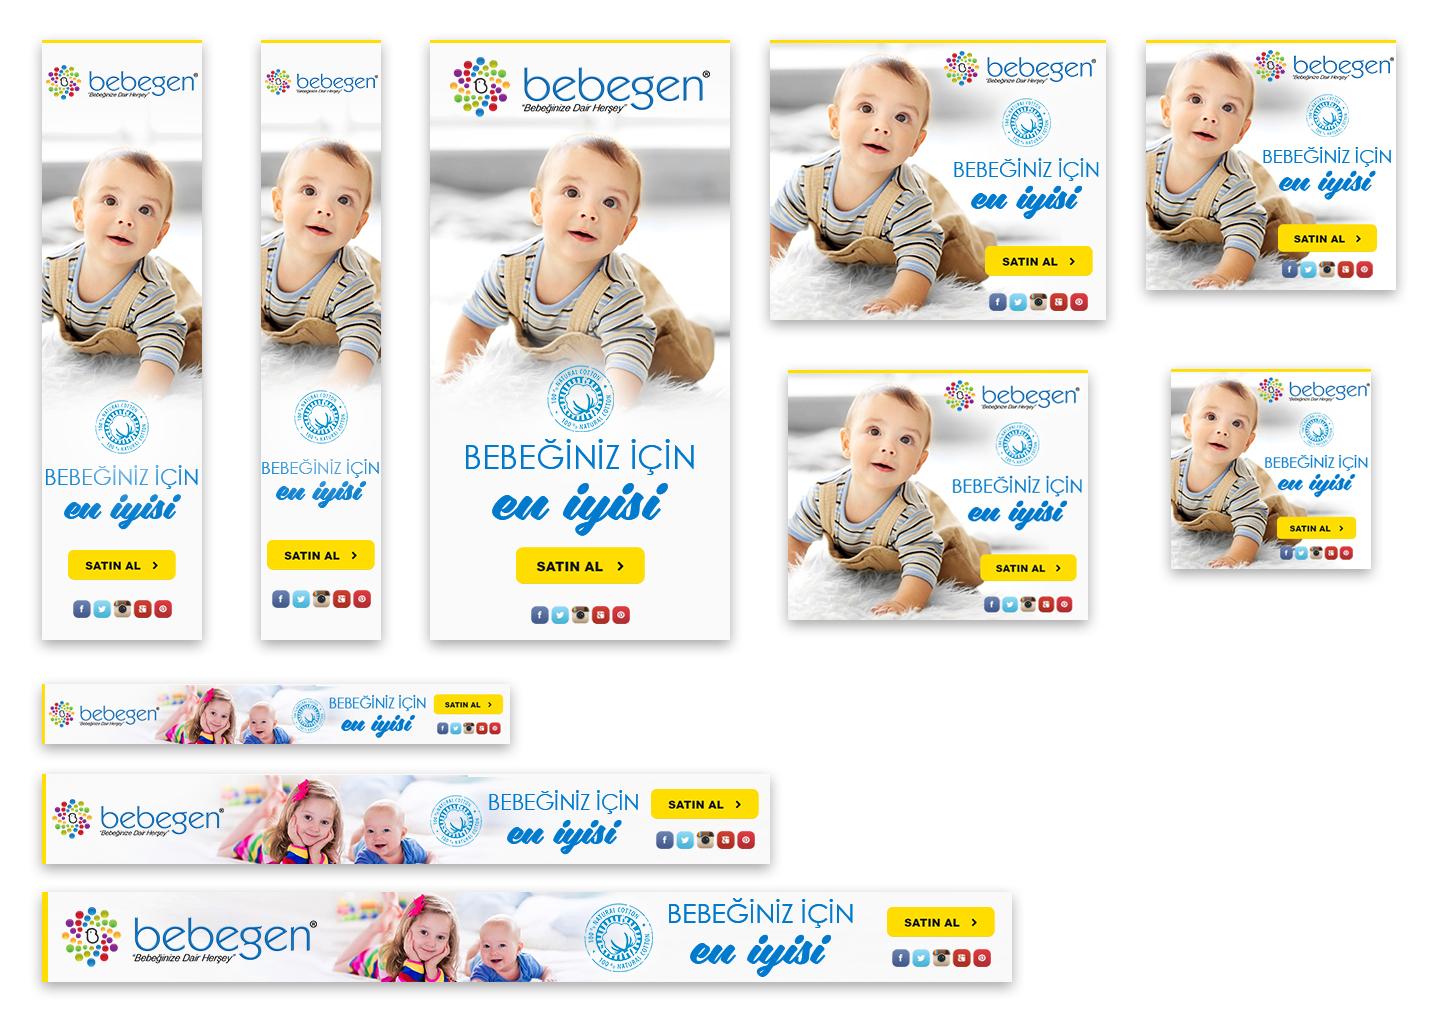 adresgezgini-bebegen-basari hikayesi-blog